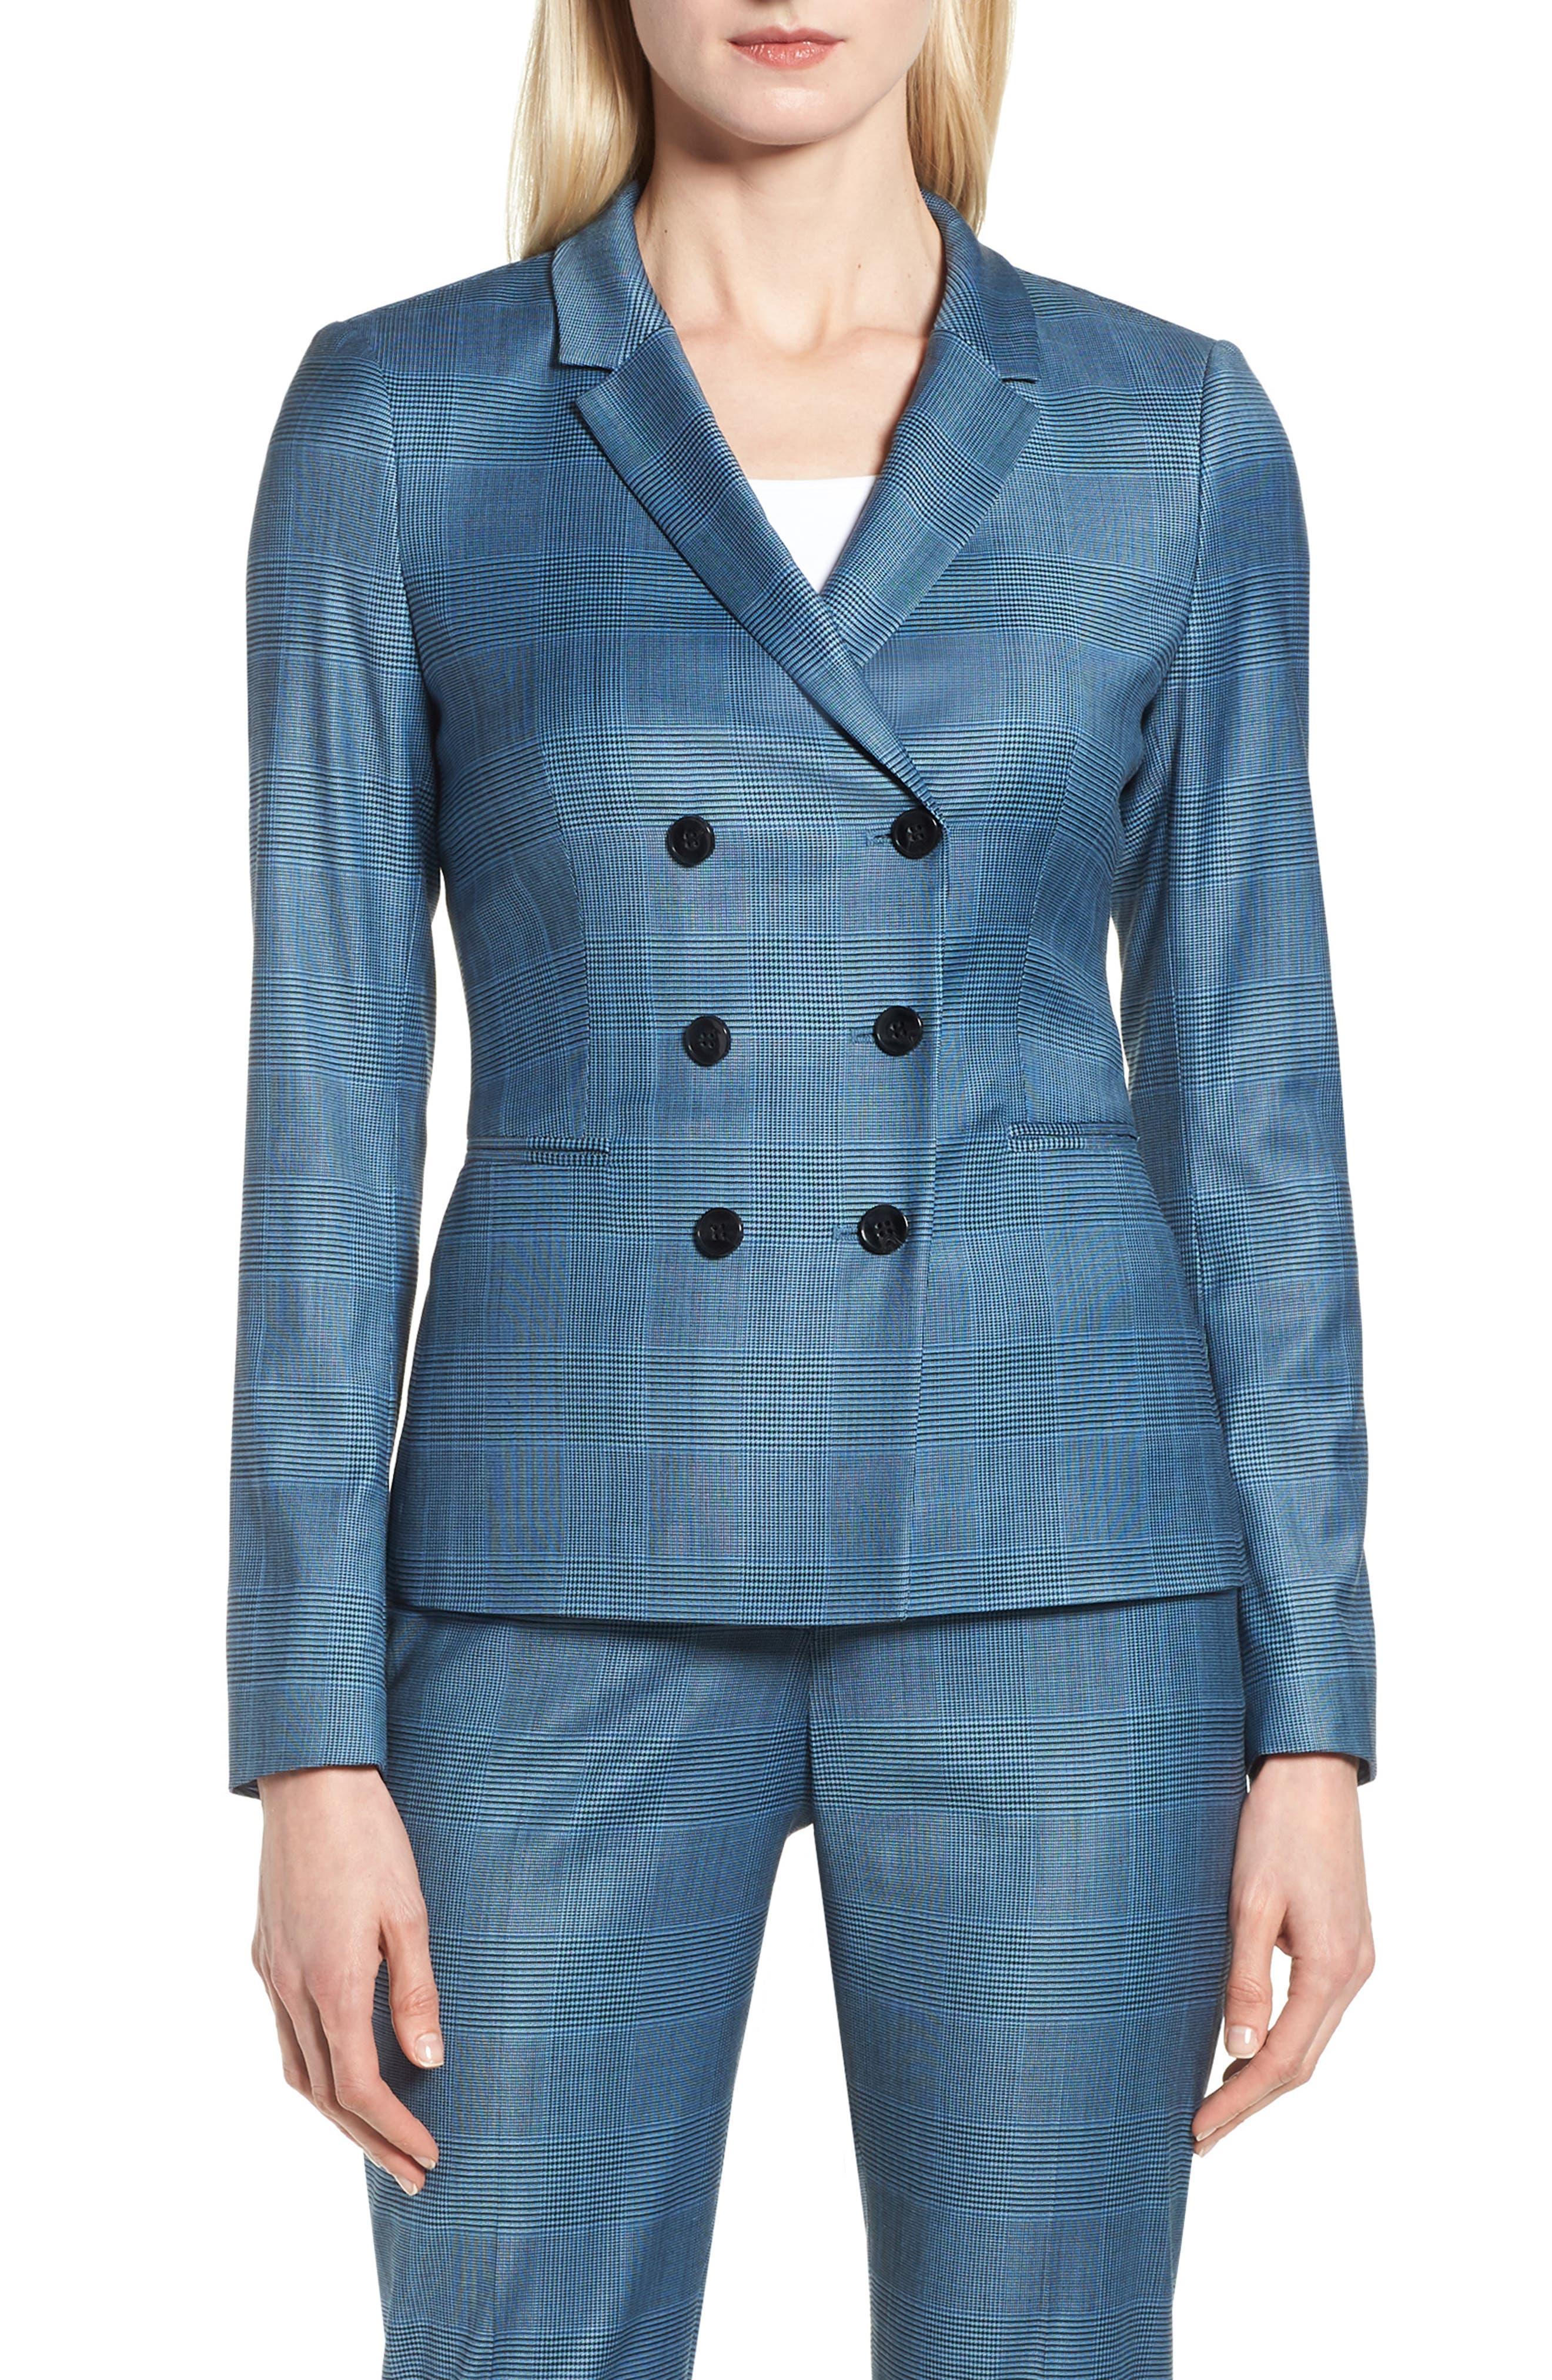 Jelaya Glencheck Double Breasted Suit Jacket,                             Main thumbnail 1, color,                             Sailor Blue Fantasy